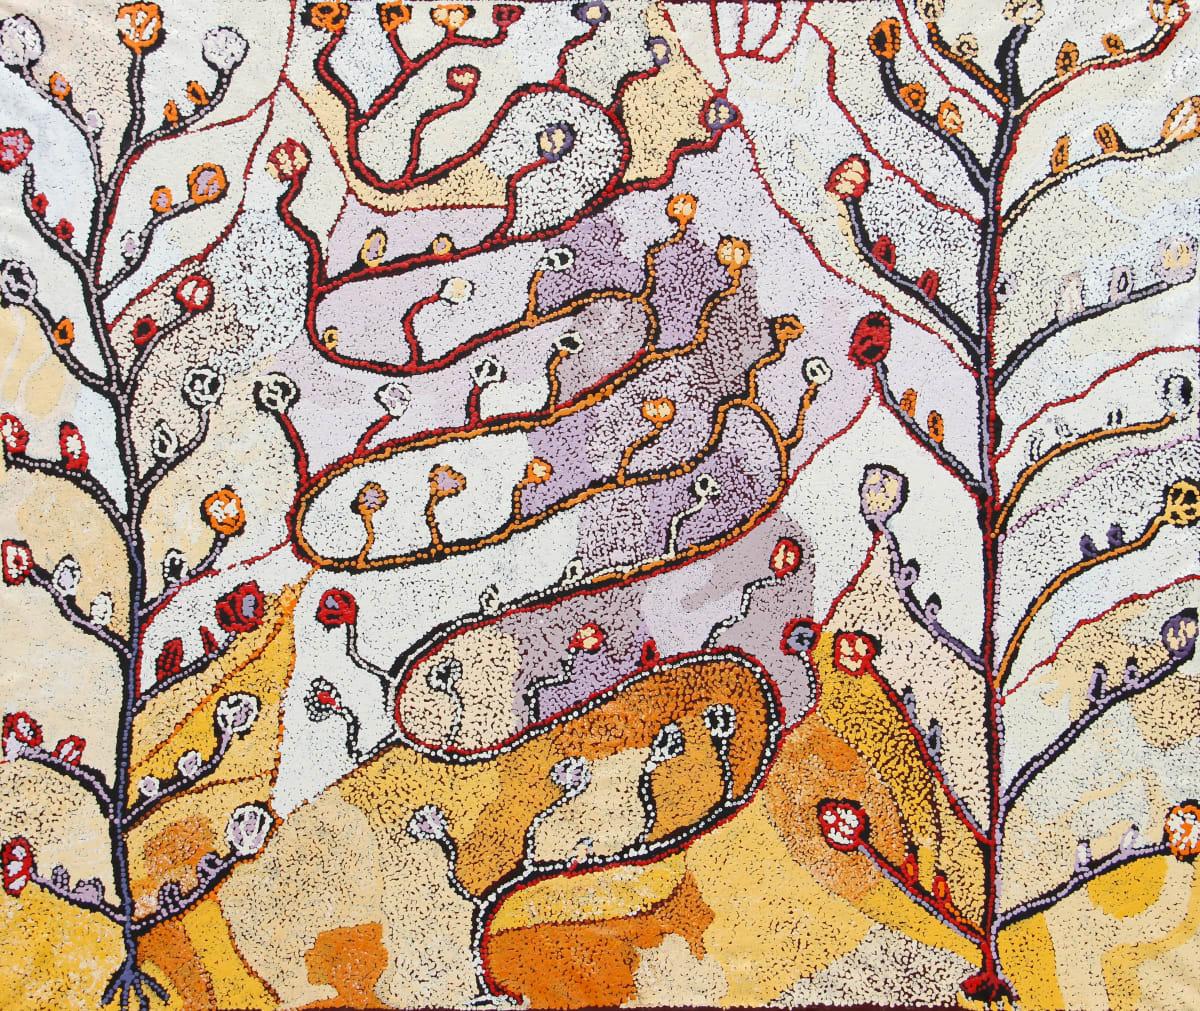 Nellie Coulthard Tjuntala Ngurangka (Country with Acacia Wattle), 2018 Acrylic on Linen 167 x 198 cm